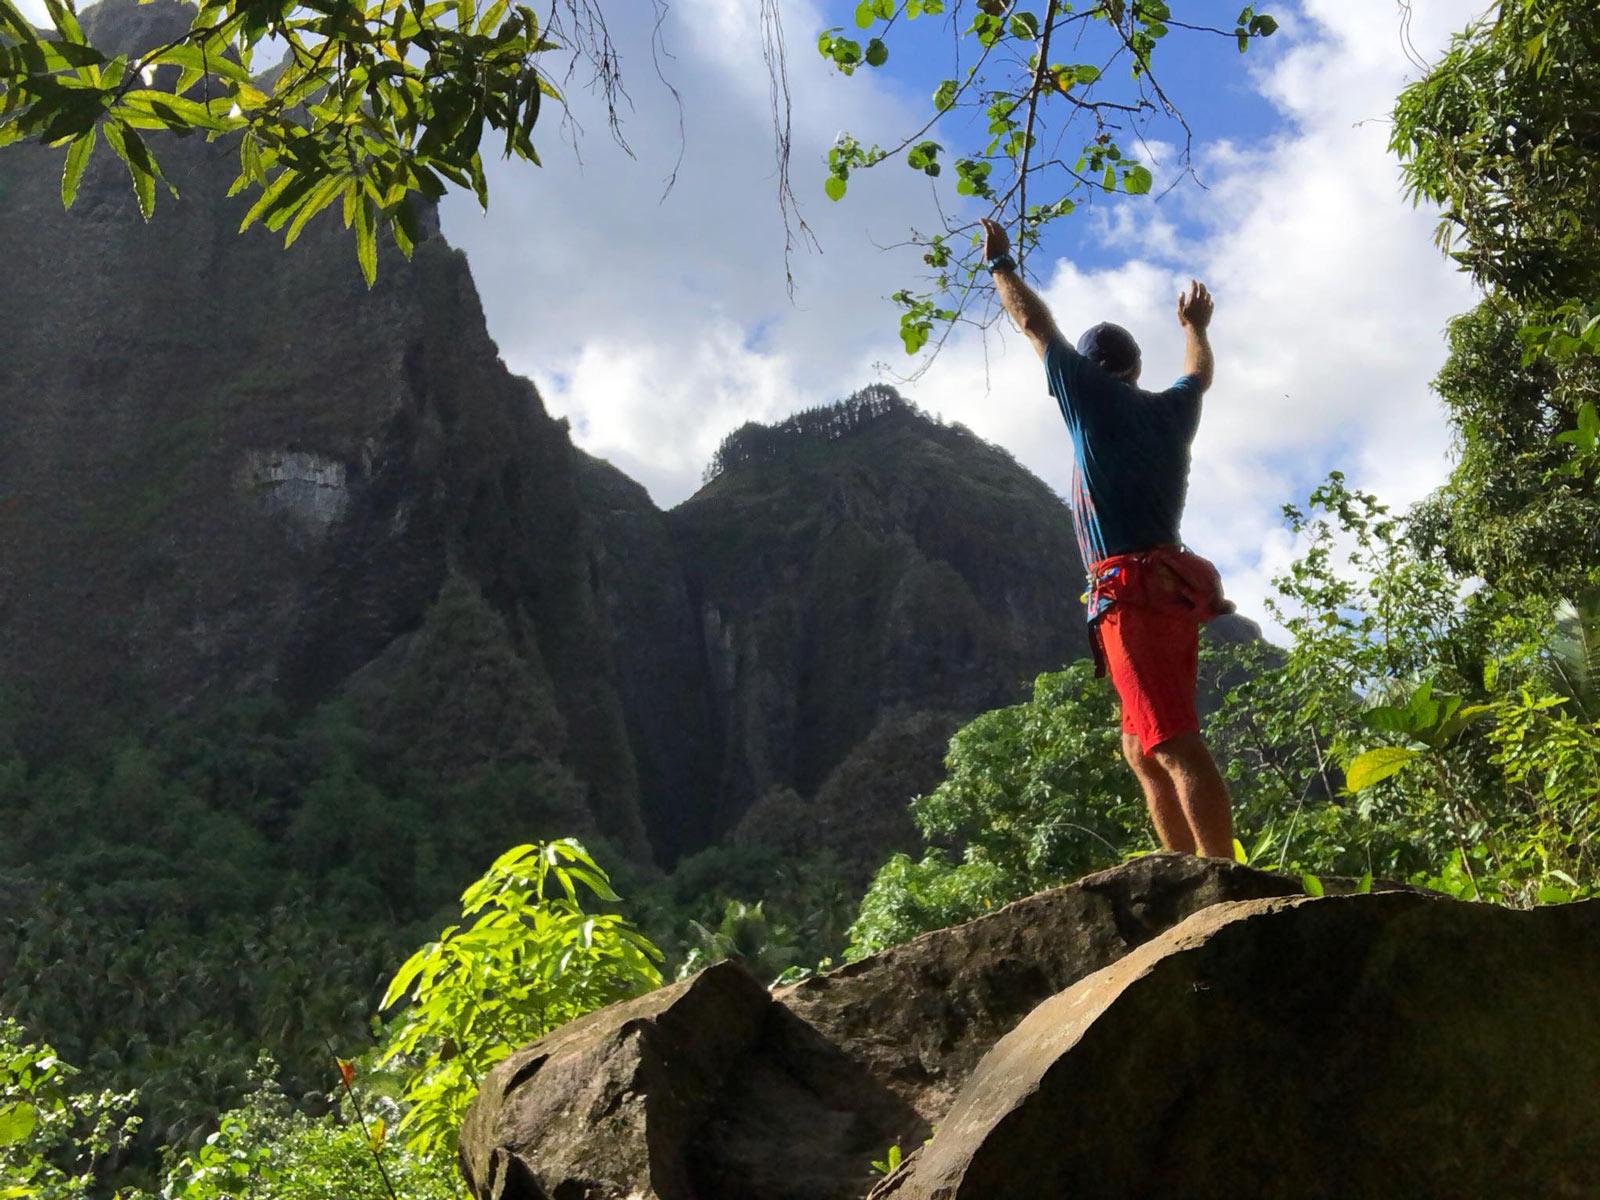 Marquesas-Island-Expedition-Bart-de-Zwarts-Daily-Journal-2